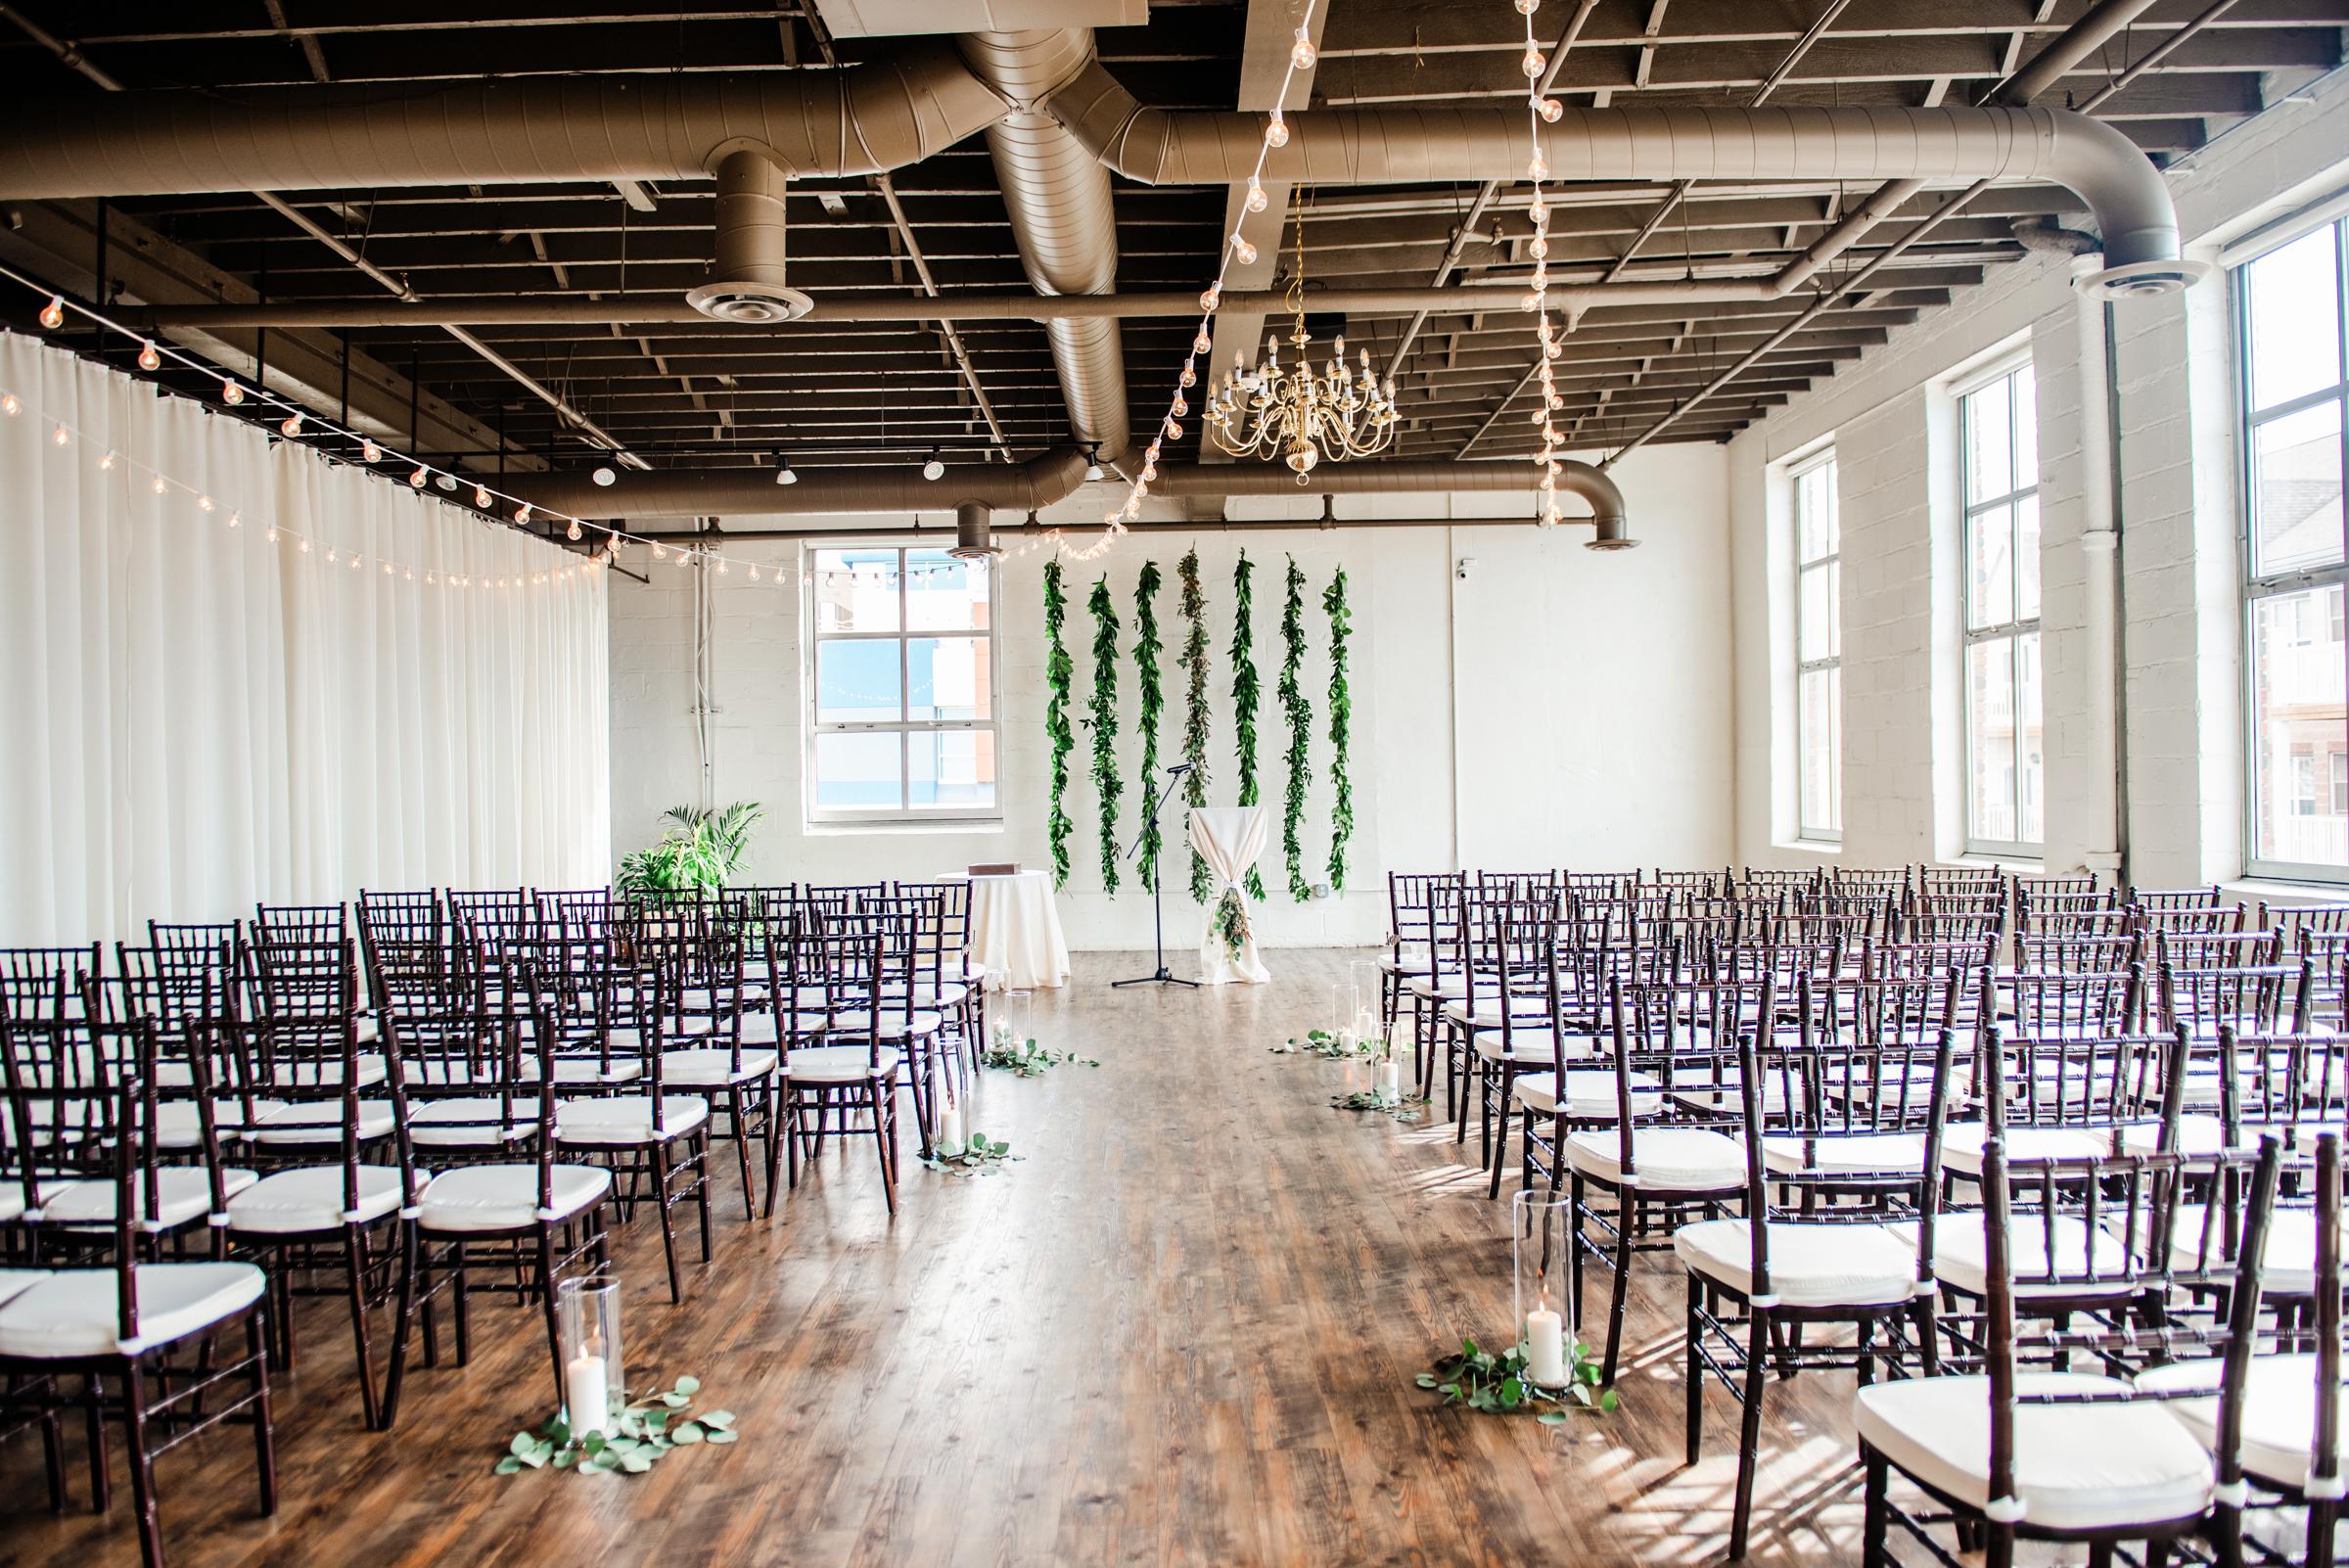 The_Arbor_LoftRochester_Wedding_JILL_STUDIO_Rochester_NY_Photographer_163455.jpg